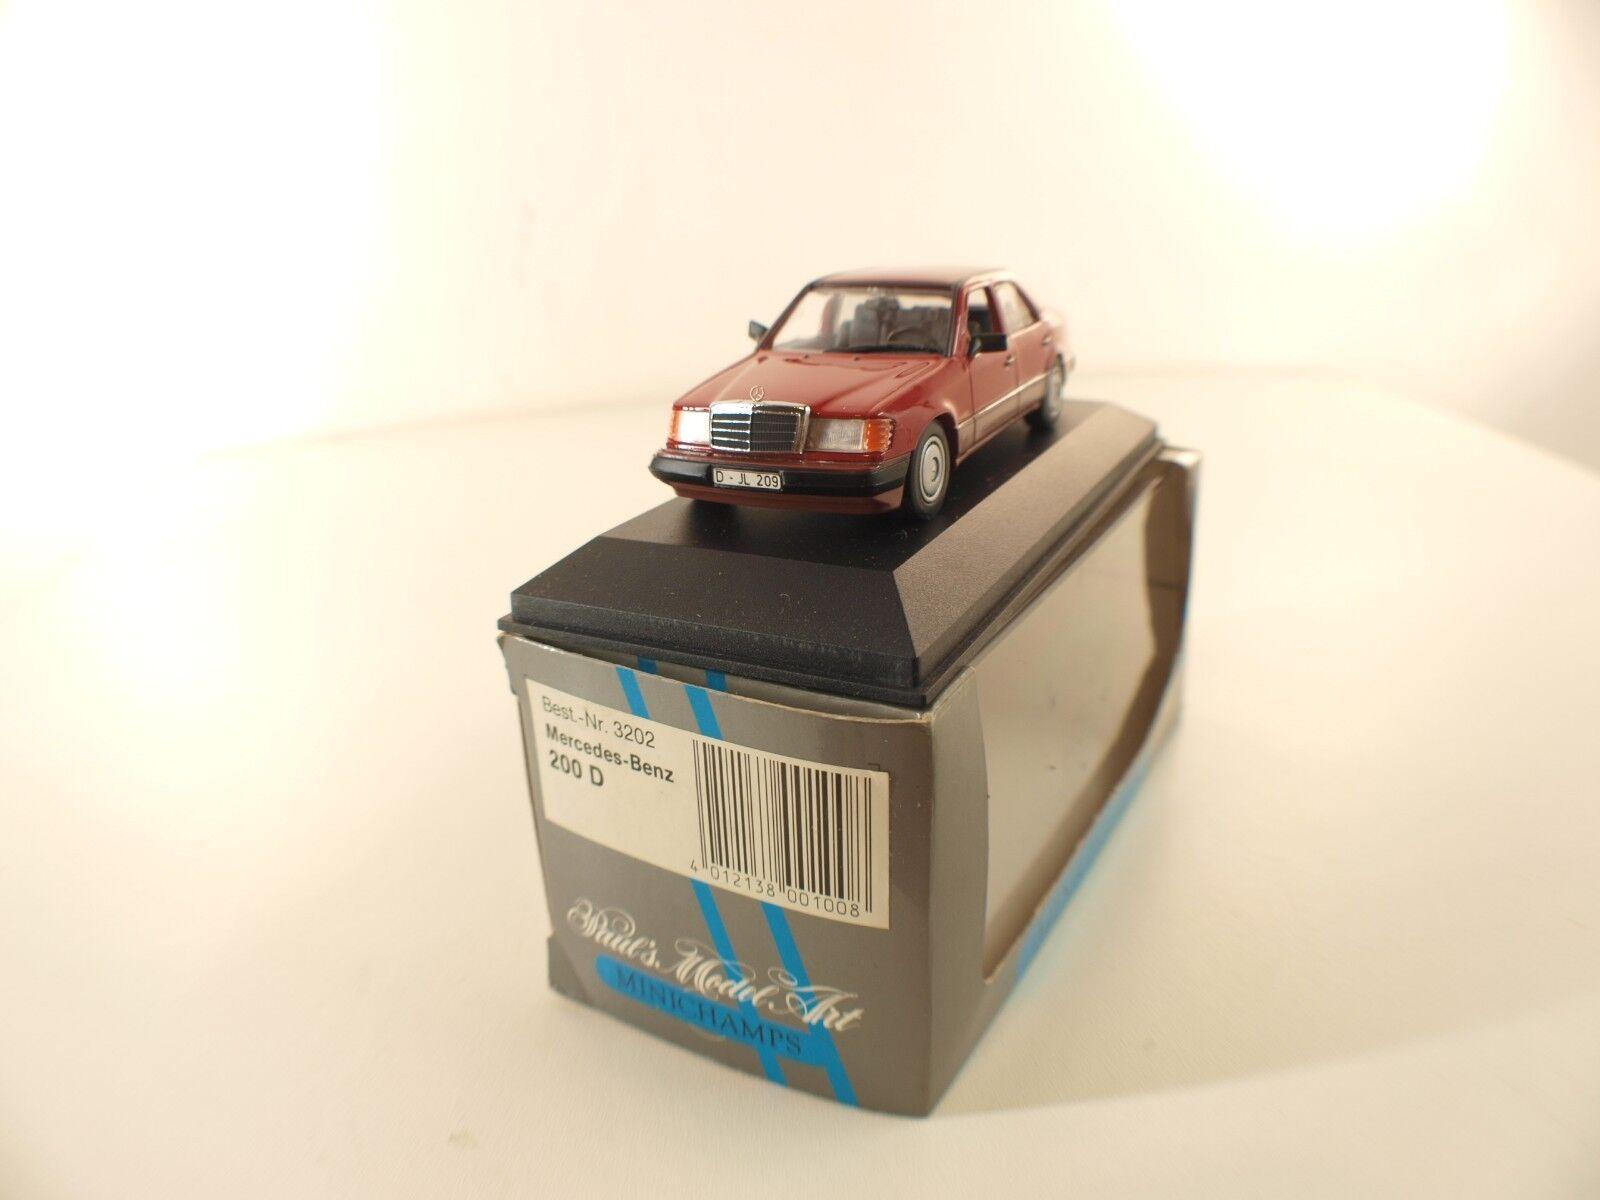 Minichamps - - - 3202 - Mercedes-Benz 200 D - 1 43 inbox en boîte 427cda